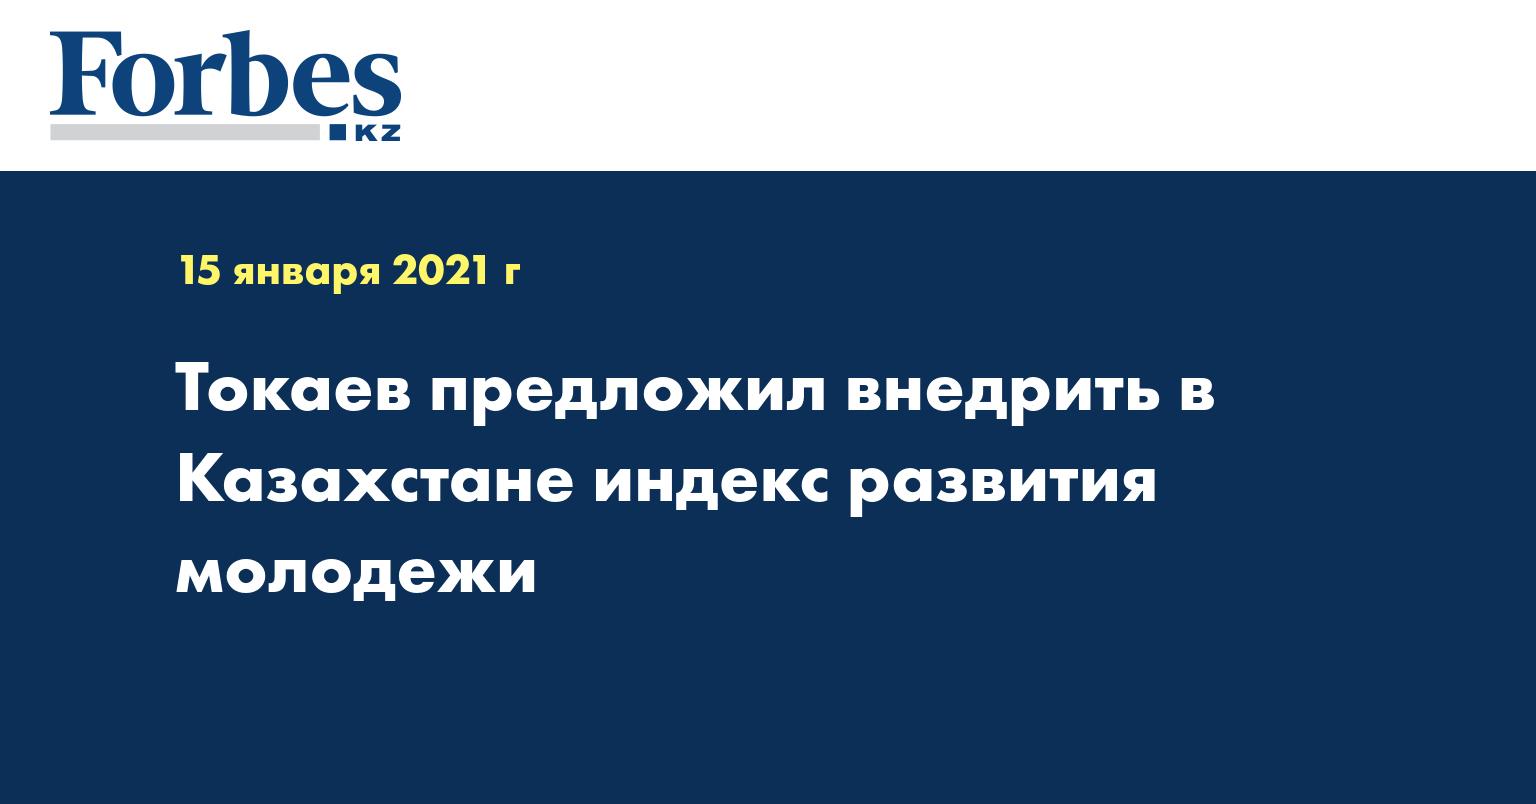 Токаев  предложил внедрить в Казахстане индекс развития молодежи